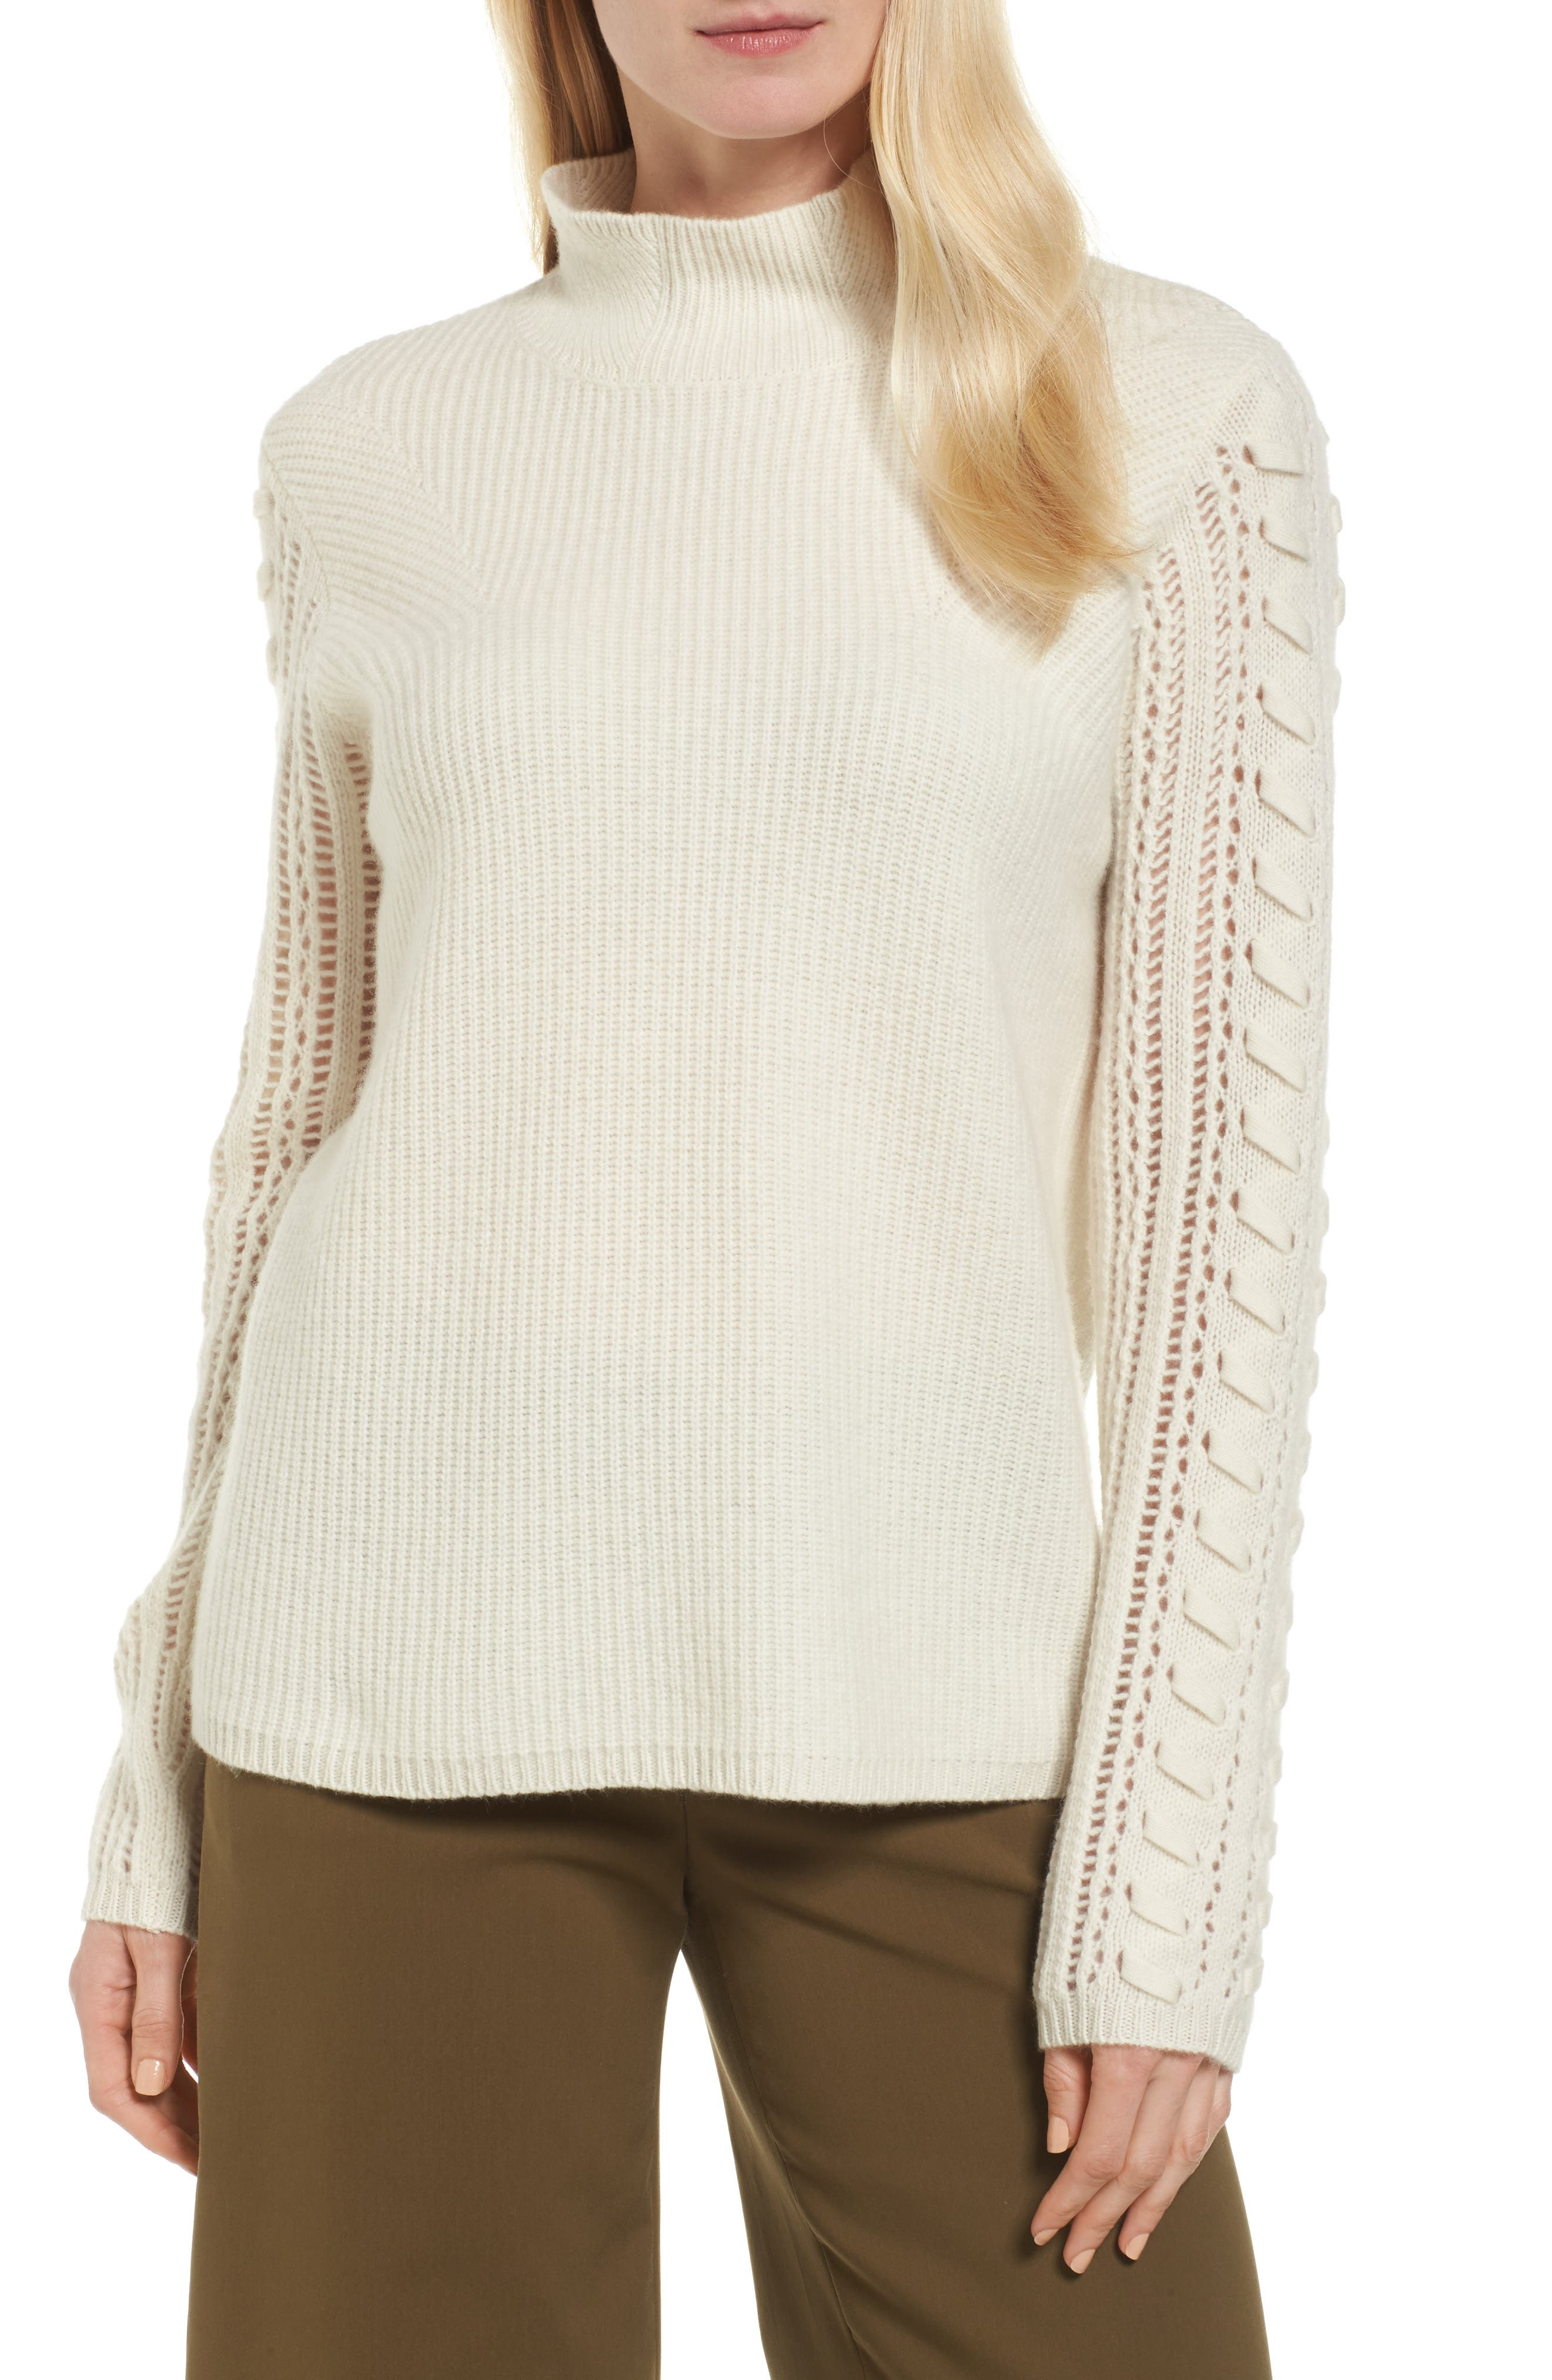 Main Image - Emerson Rose Mixed Stitch Cashmere Sweater